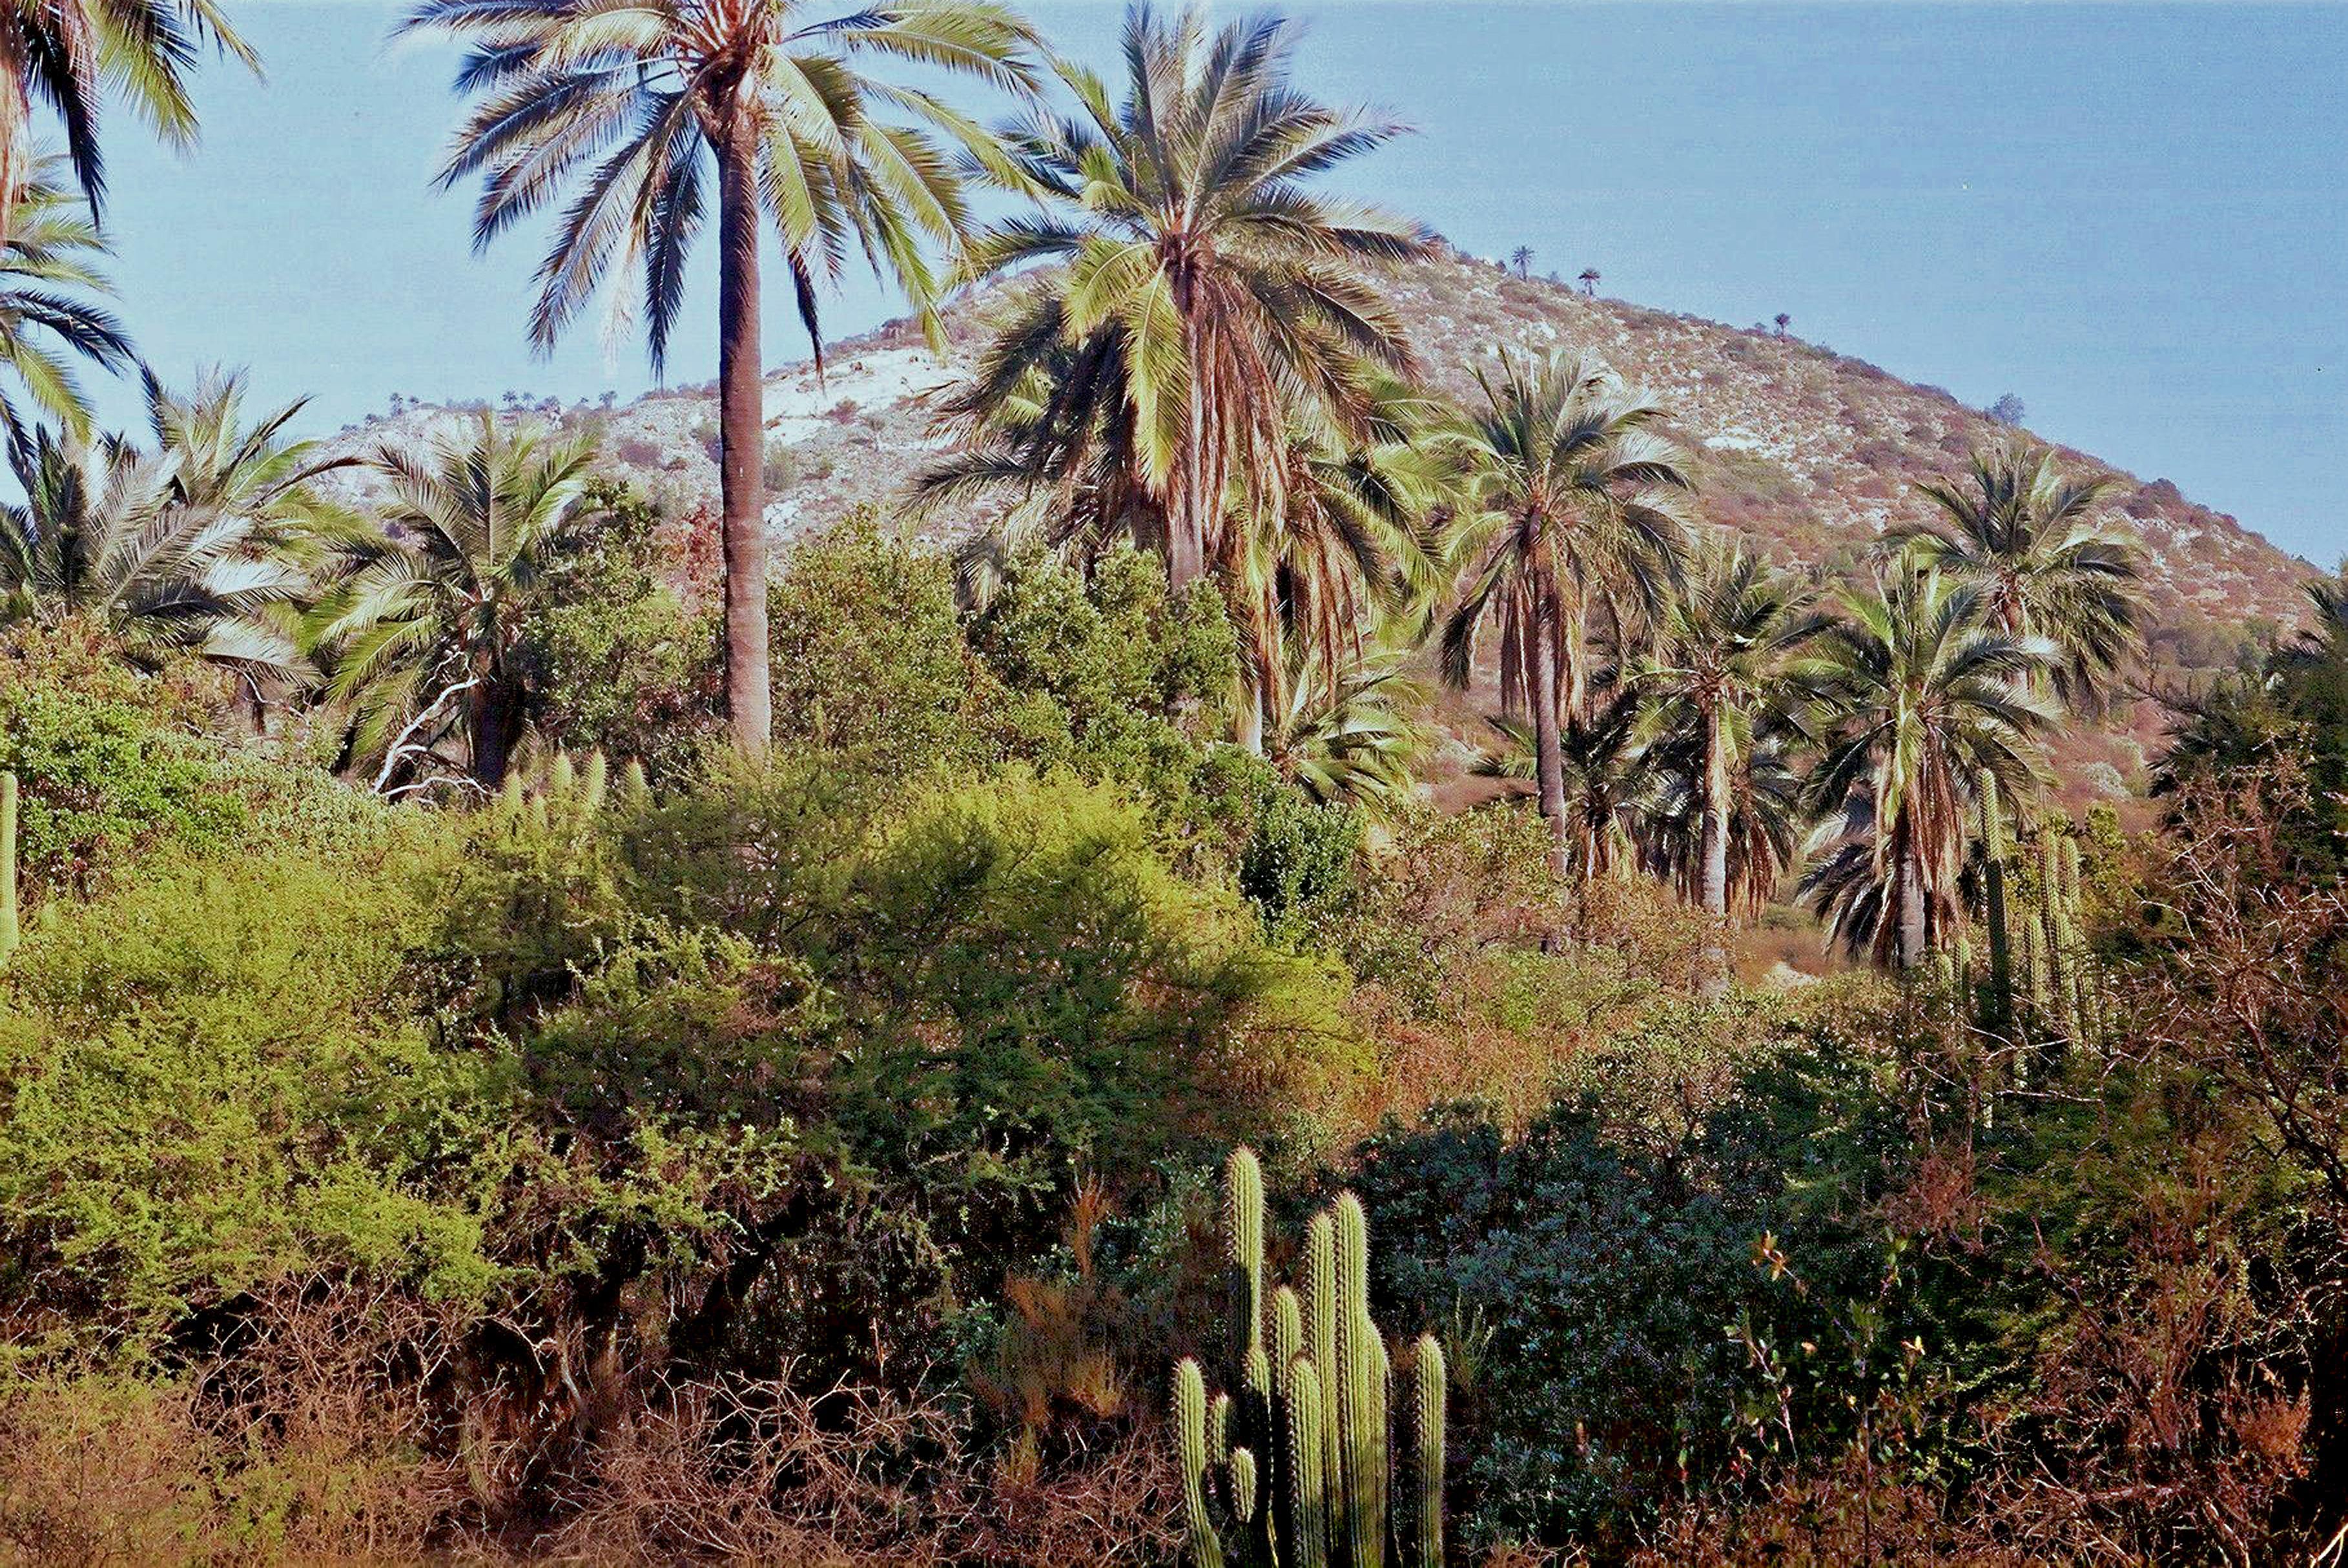 Jubaea_chilensis_-_Palmares_de_Ocoa_-_Chile_por_Jorge_Leon_Cabello_-_002.jpg (Image JPEG, 3636x2428 pixels) - Redimensionnée (34%)